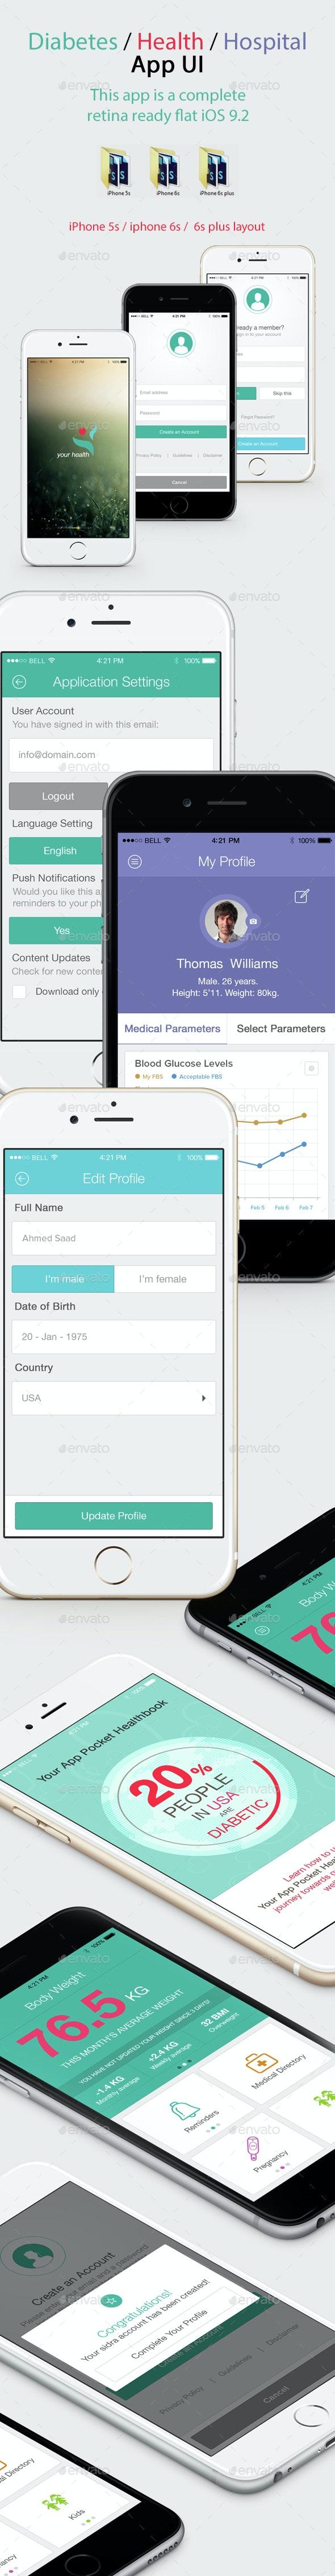 Diabetes Health Hospital Mobile App UI - User Interfaces Web Elements